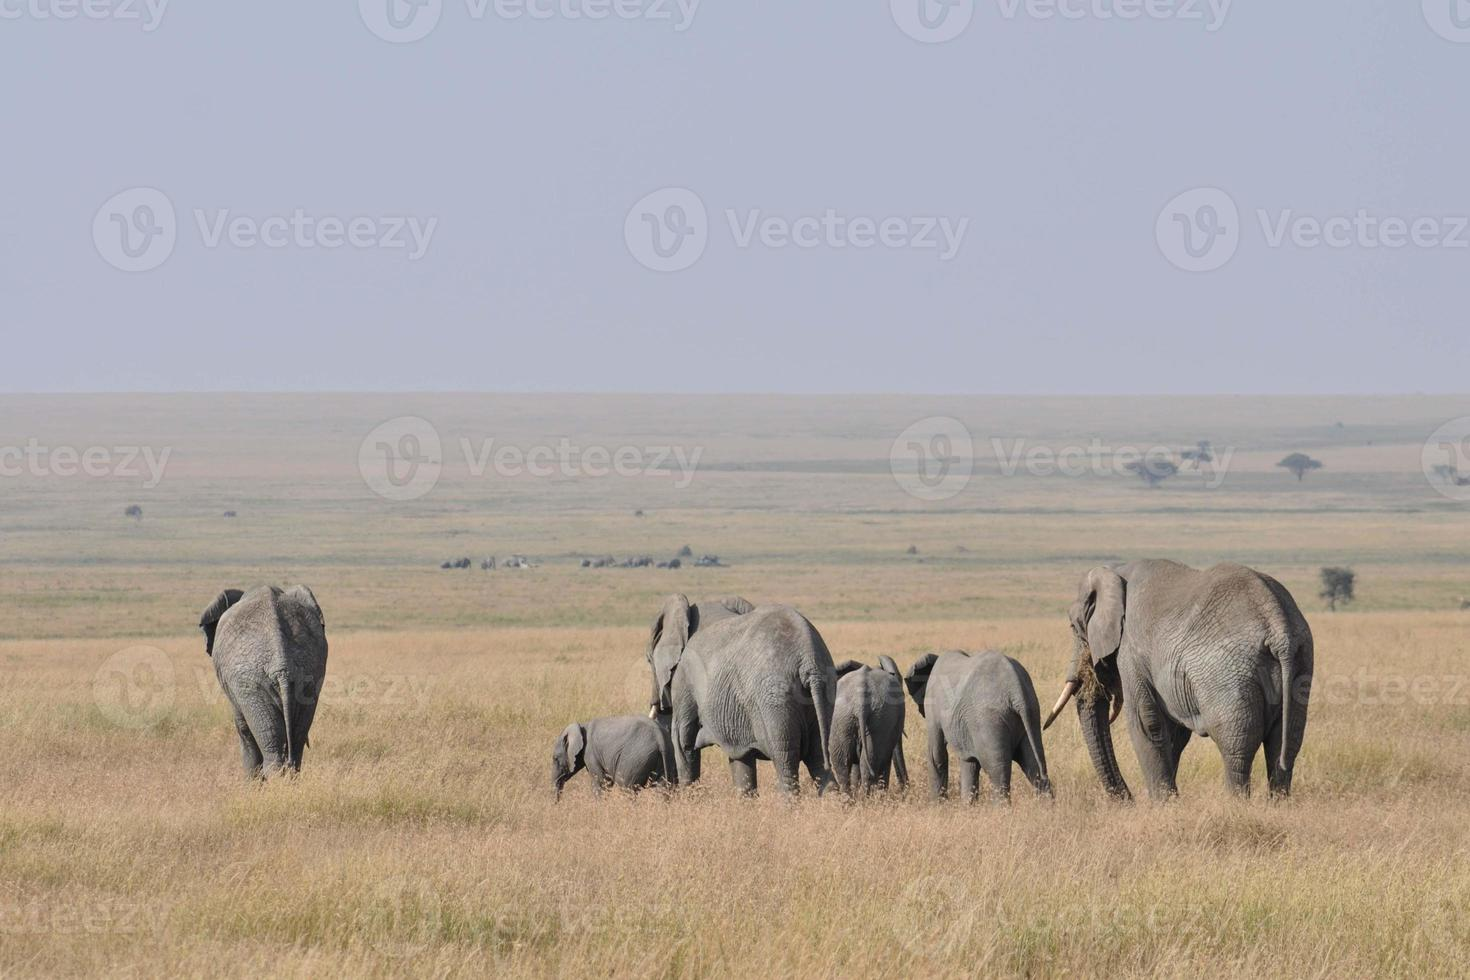 elefantflock som går bort foto